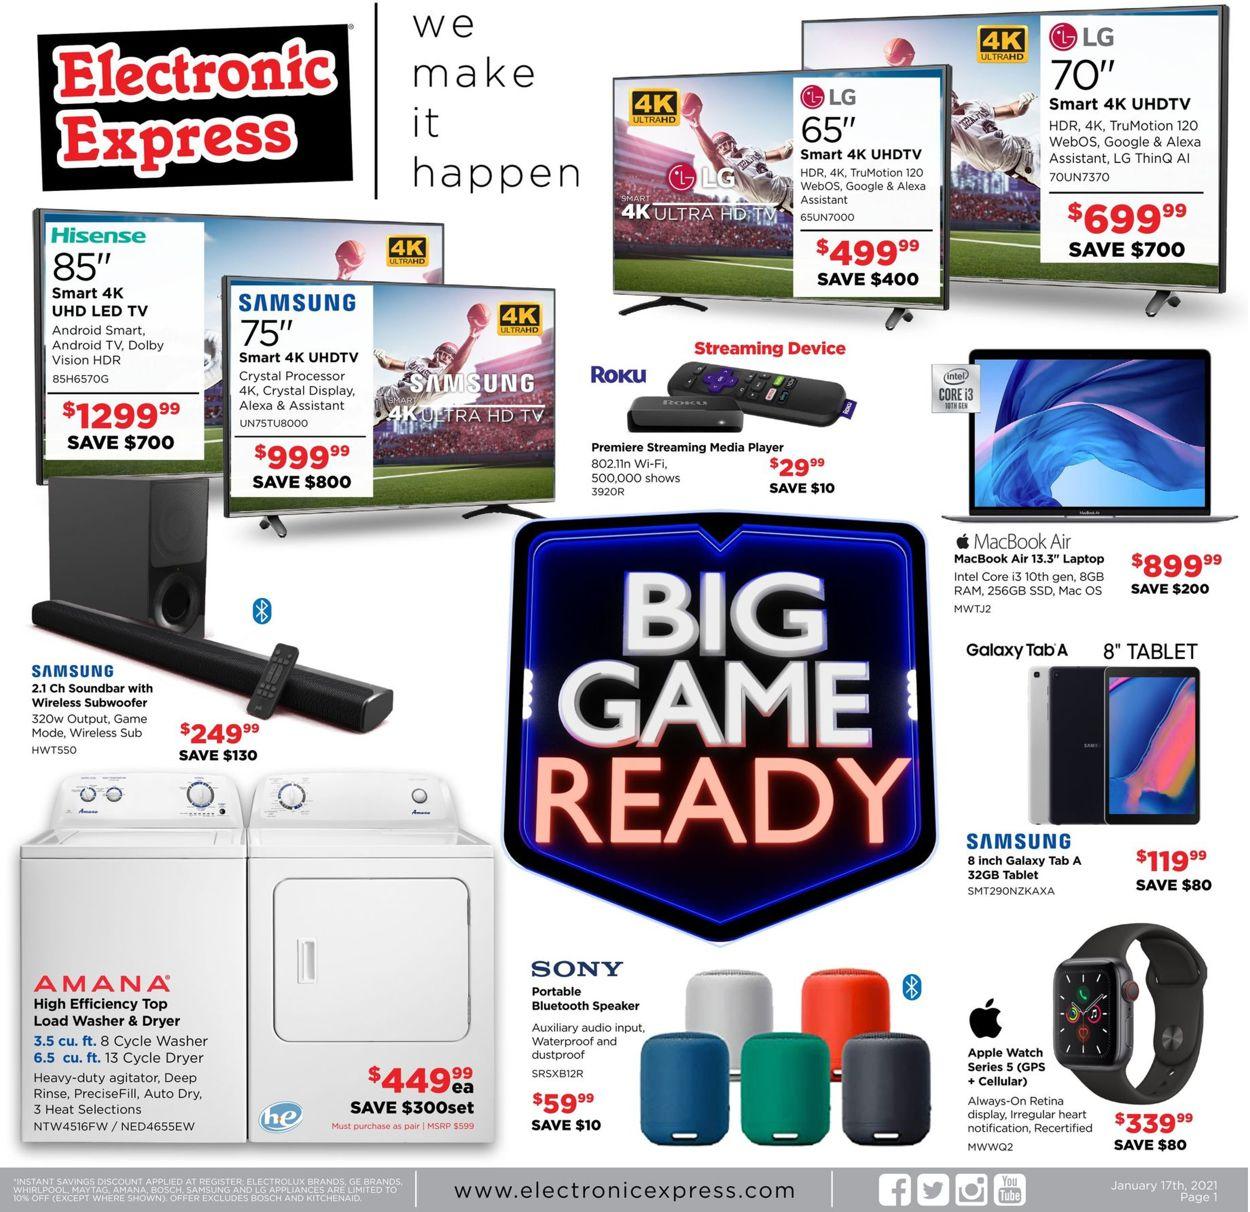 Electronic Express Weekly Ad Circular - valid 01/17-01/23/2021